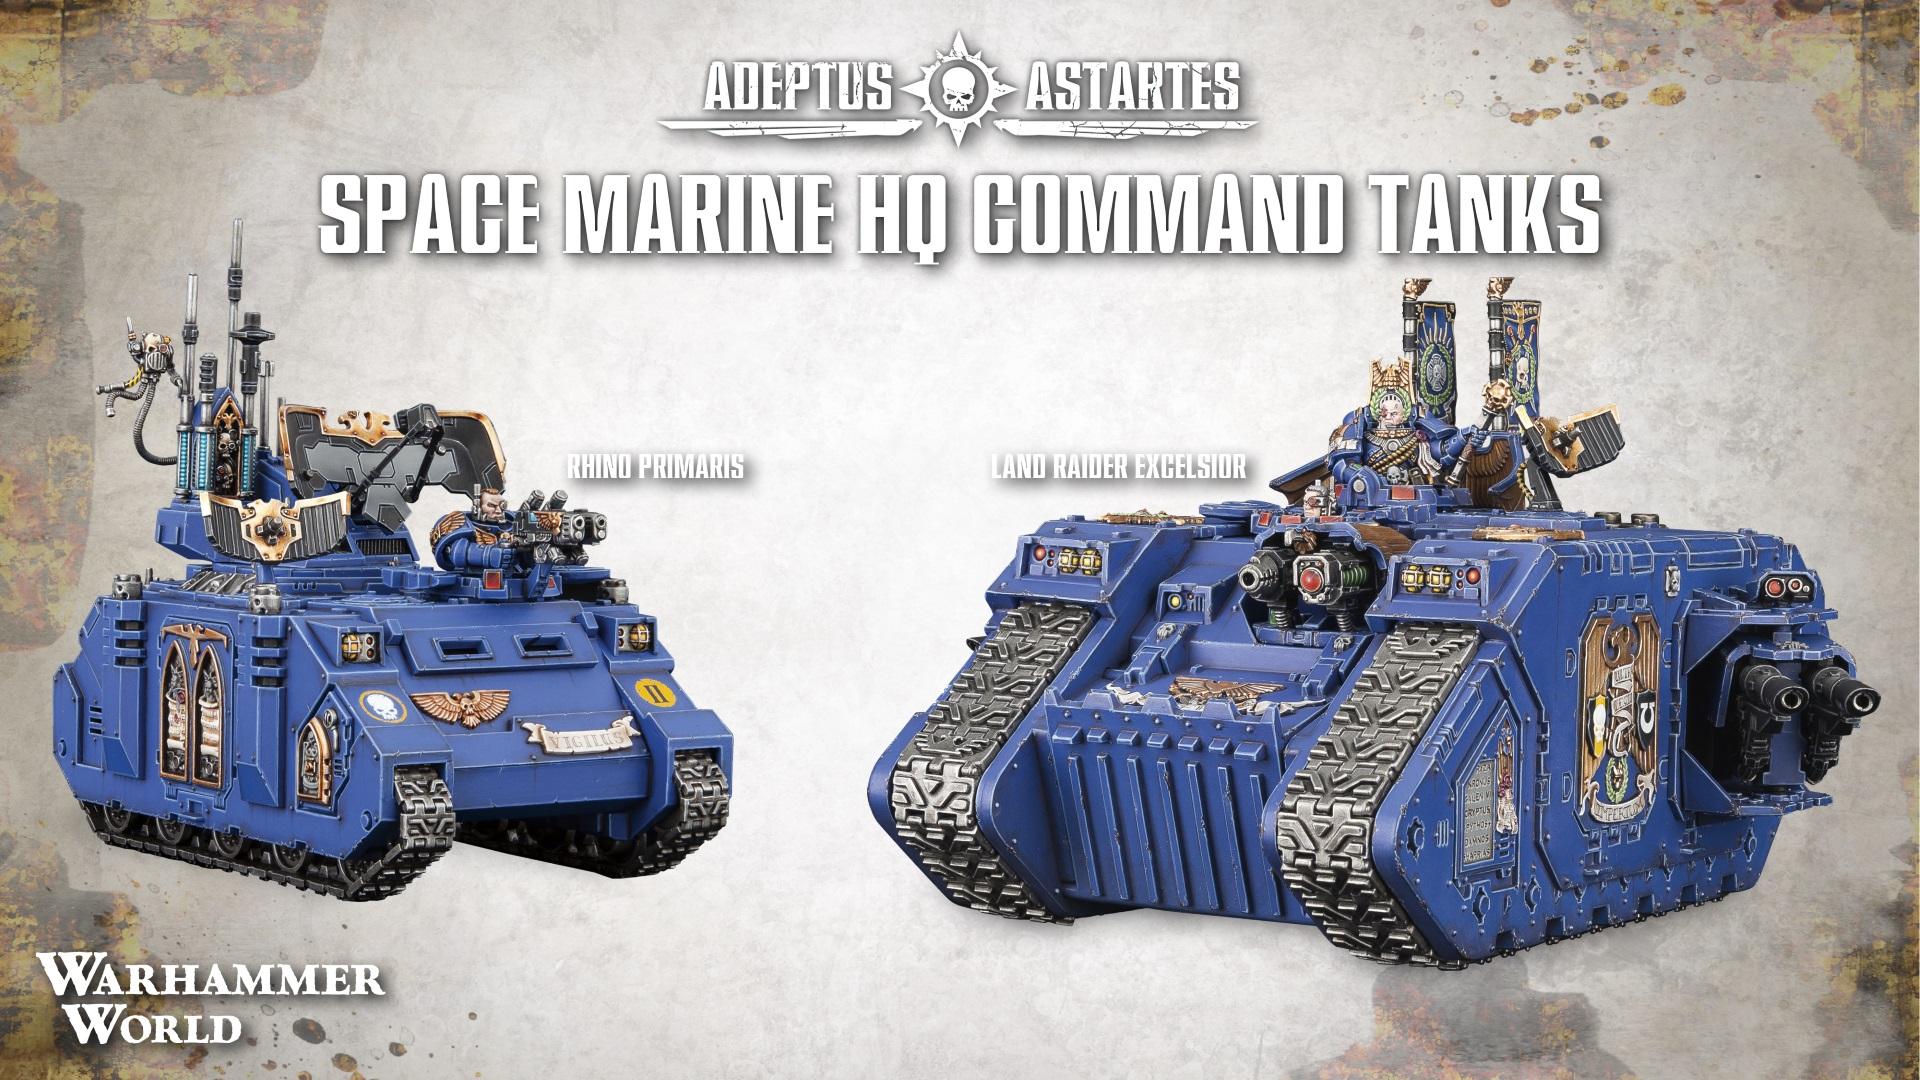 Space Marine HQ Command Tanks